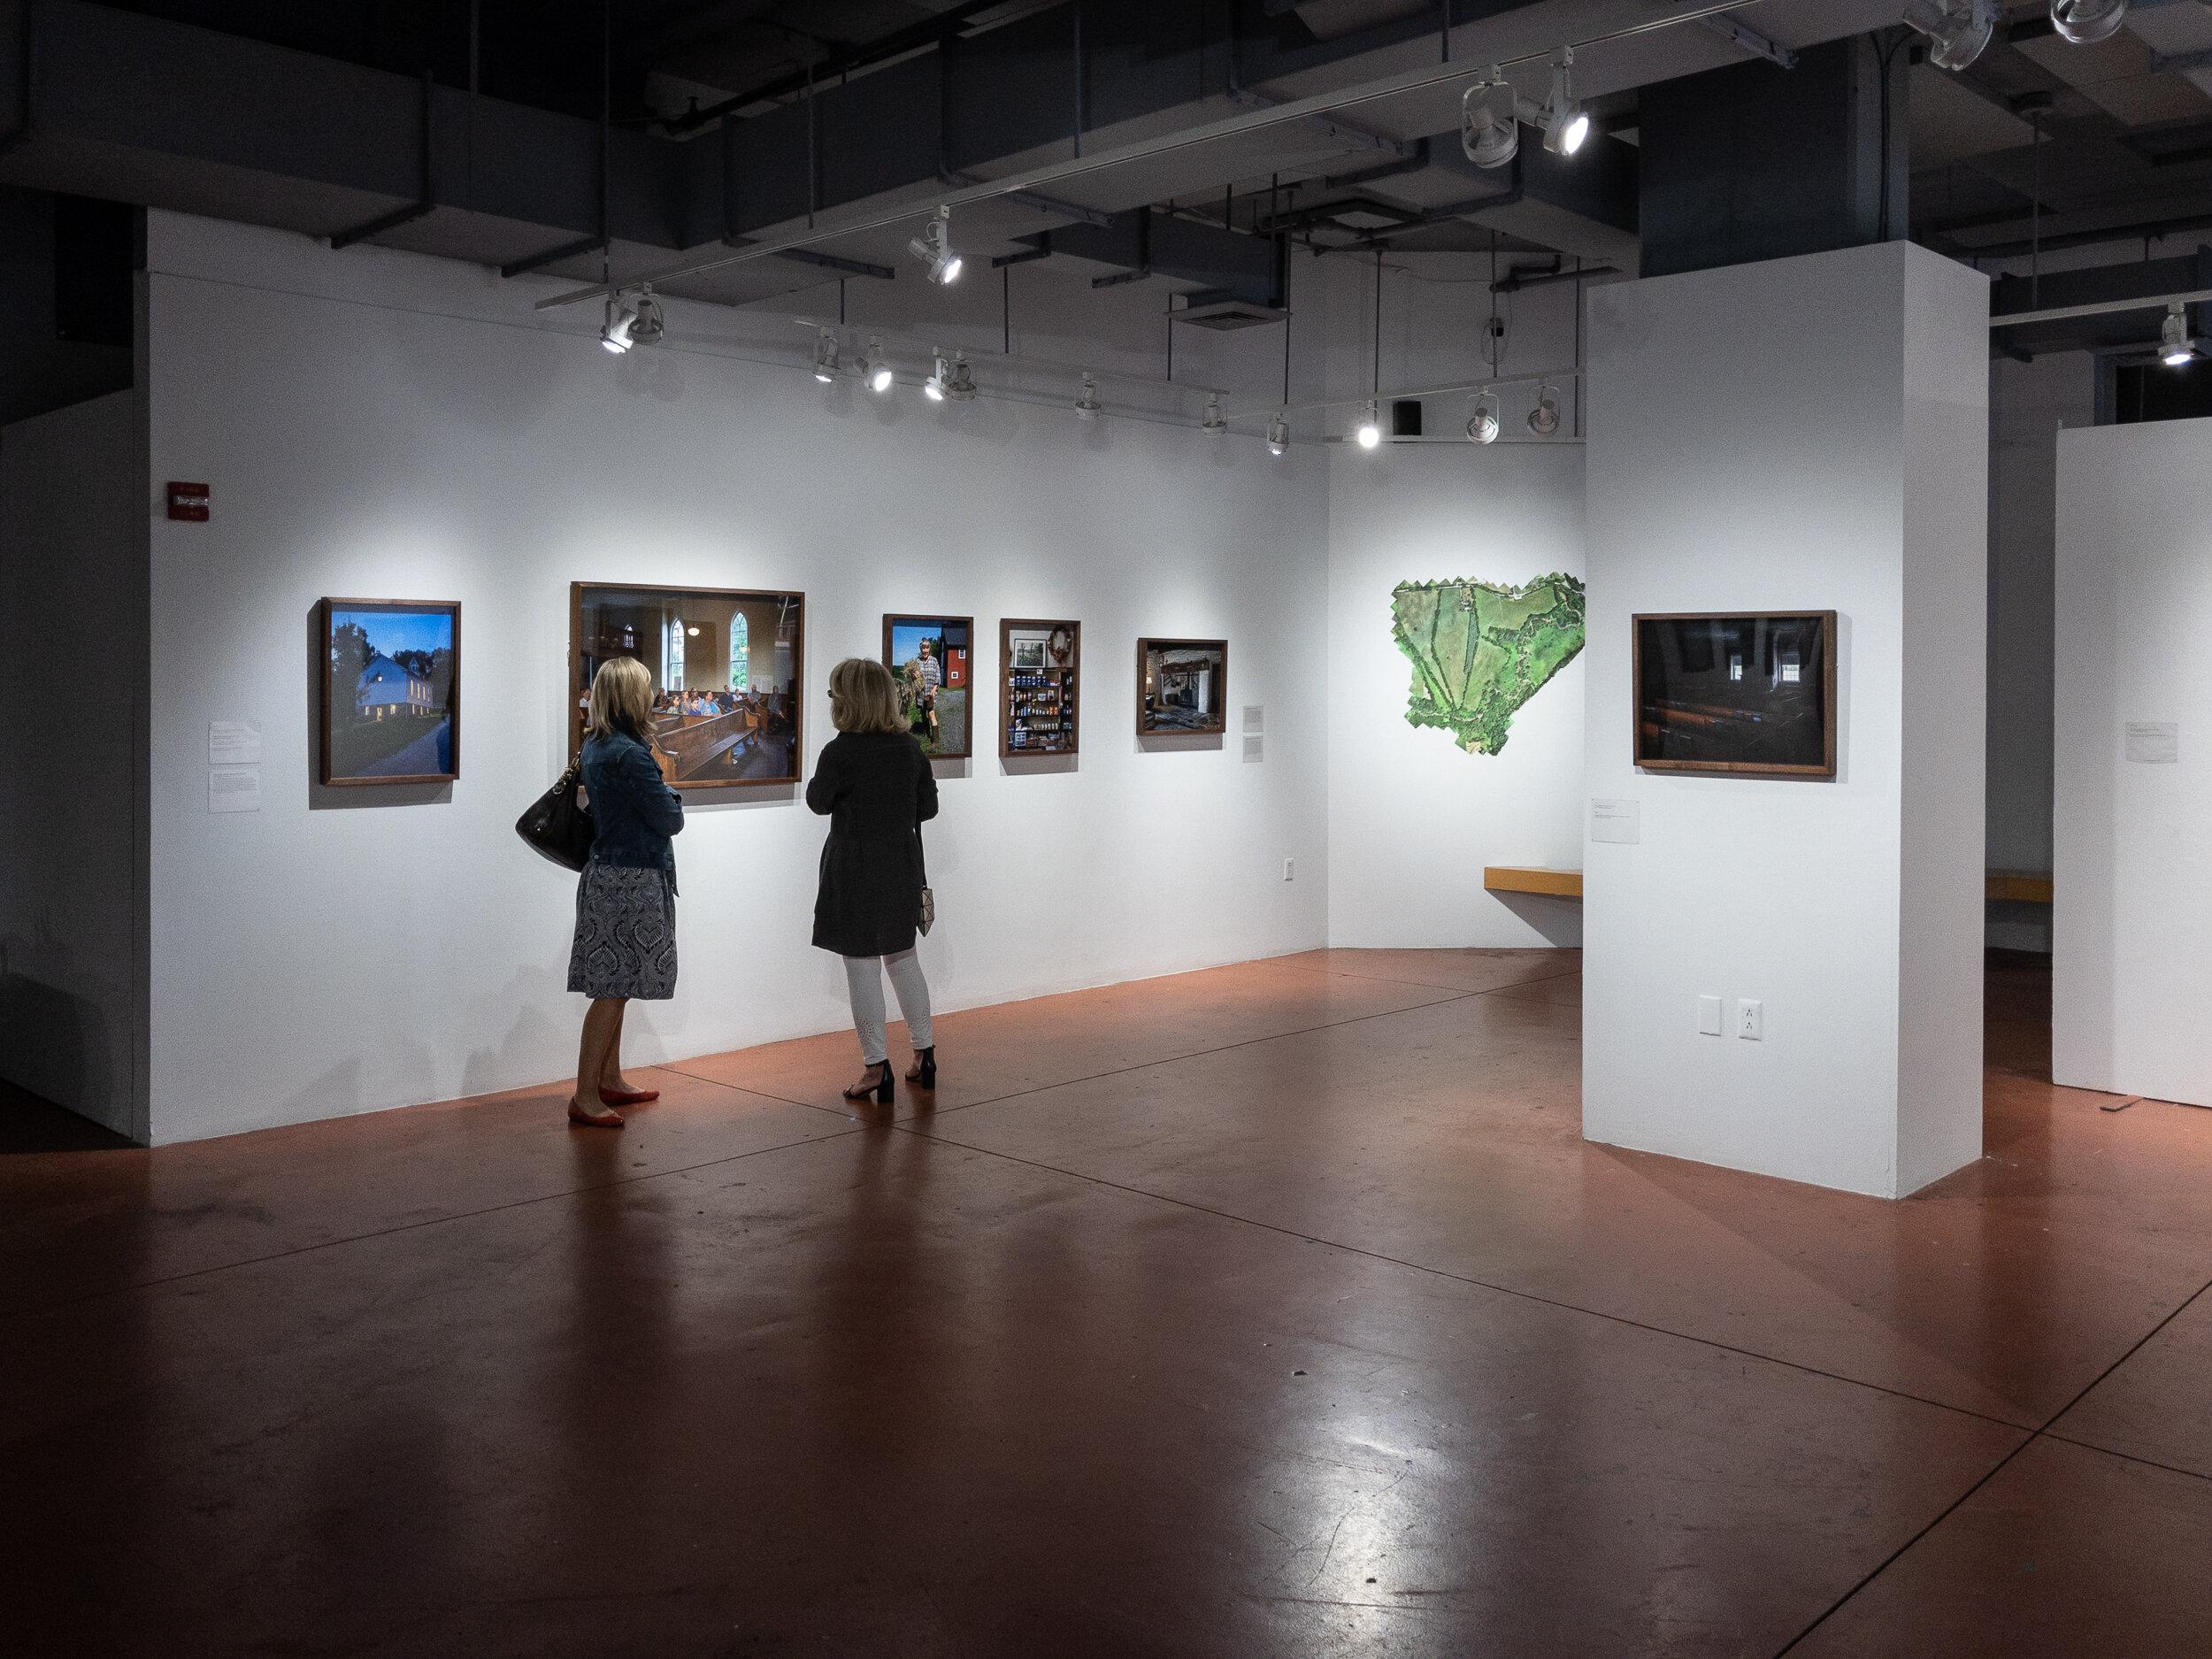 Installation at the Greater Reston Arts Center, 9/28/19 – 1/4/20